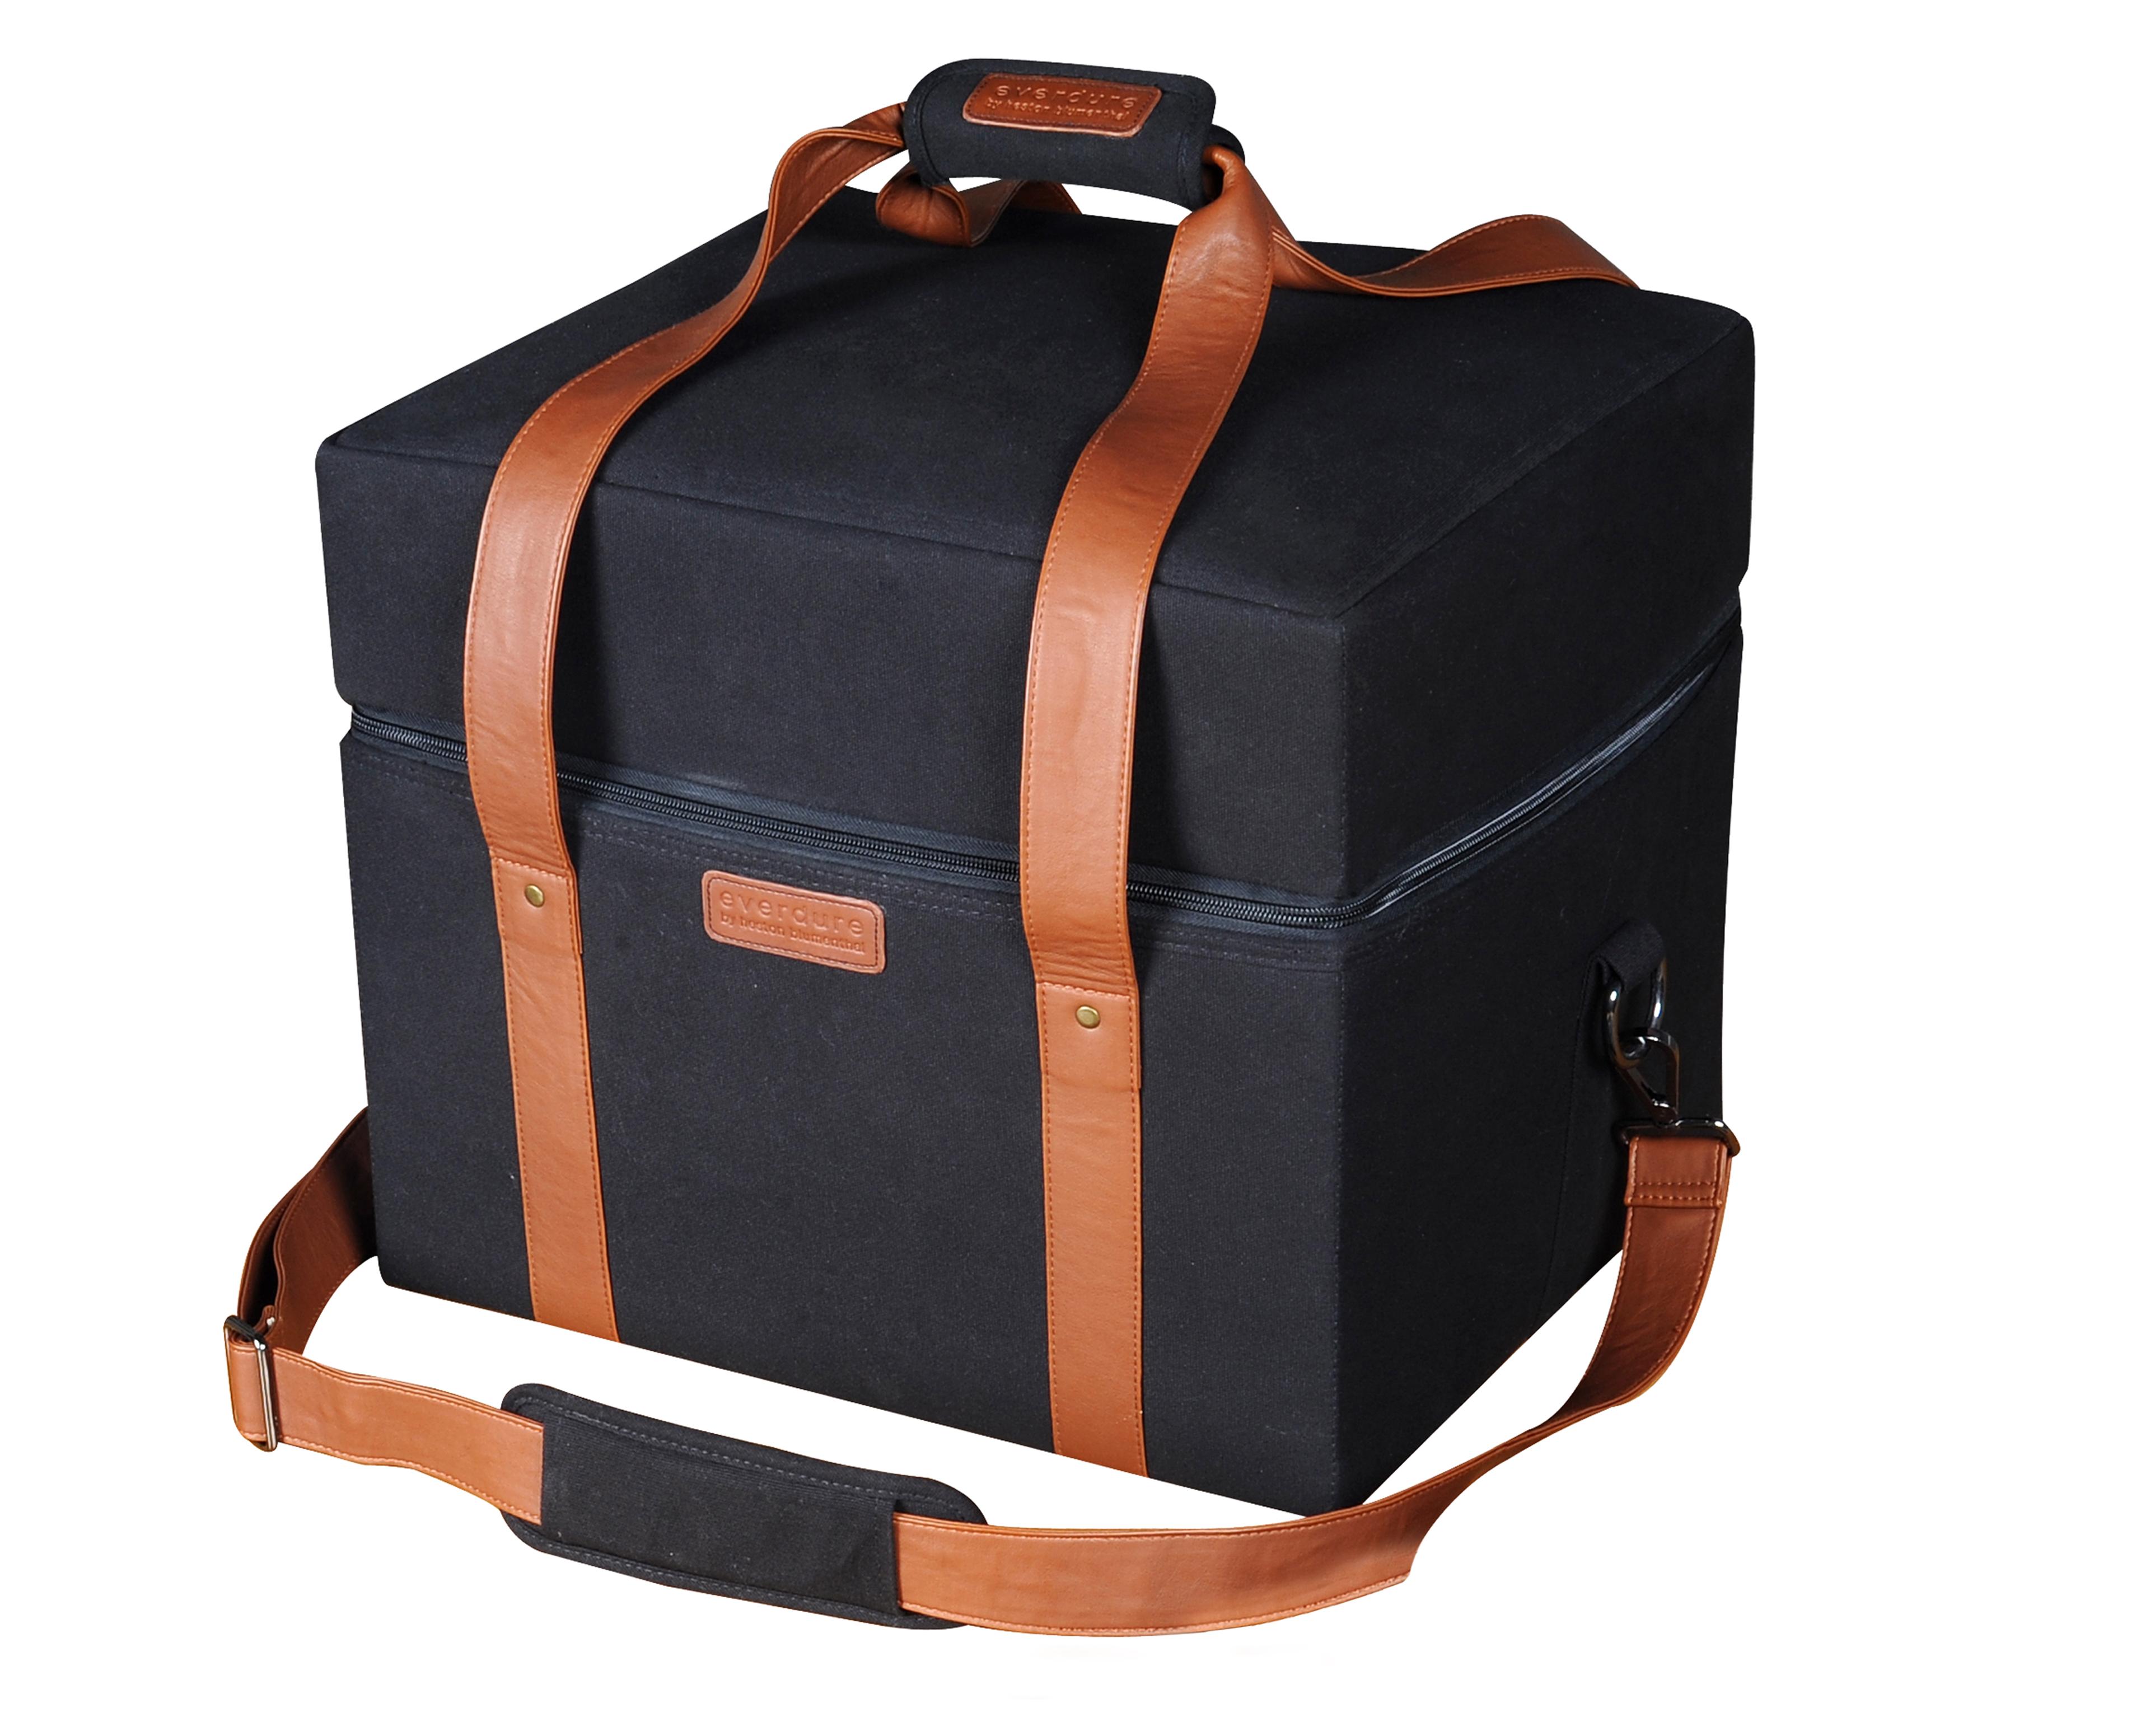 CUBE travel bag